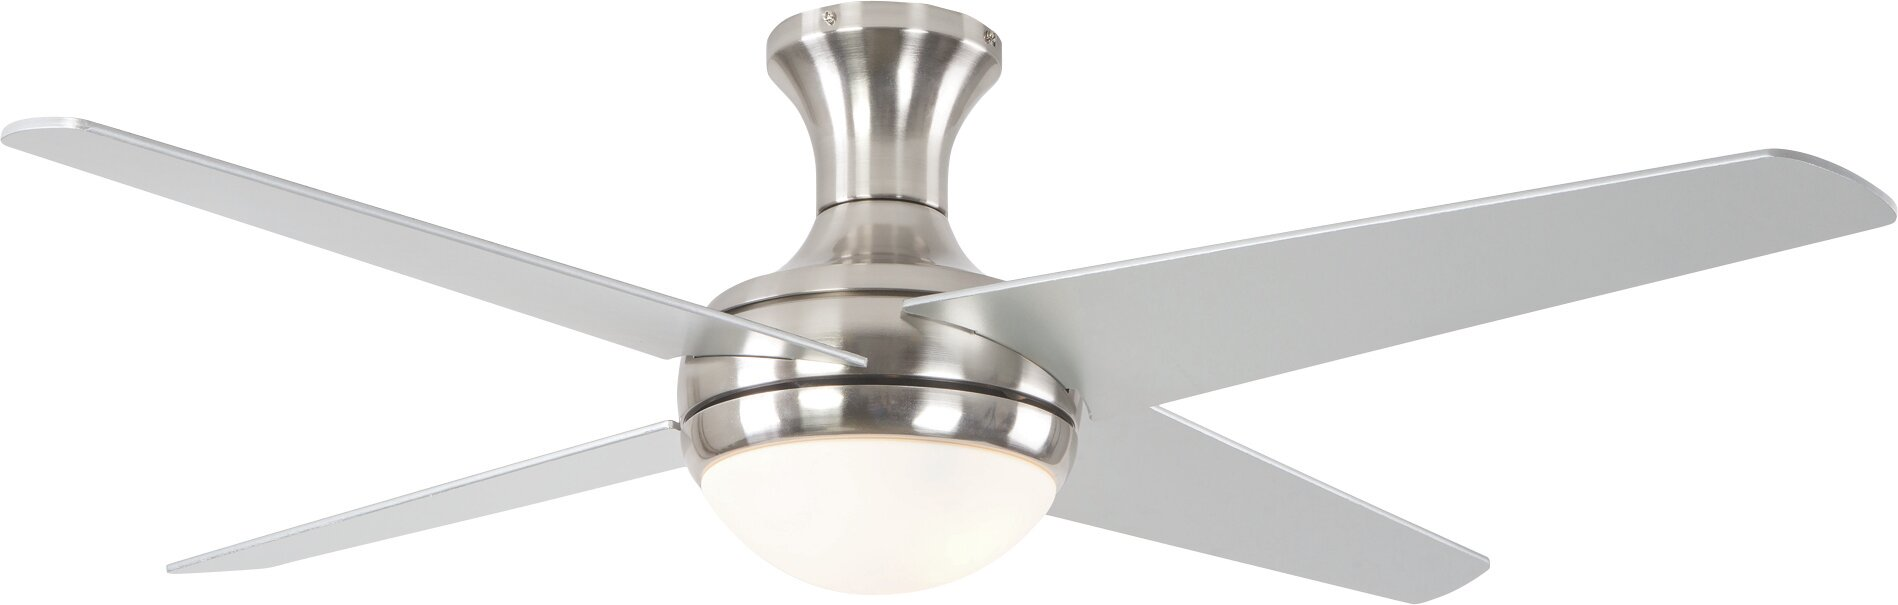 Zipcode design 52 lizzy 4 blade ceiling fan reviews wayfair 52 lizzy 4 blade ceiling fan mozeypictures Gallery